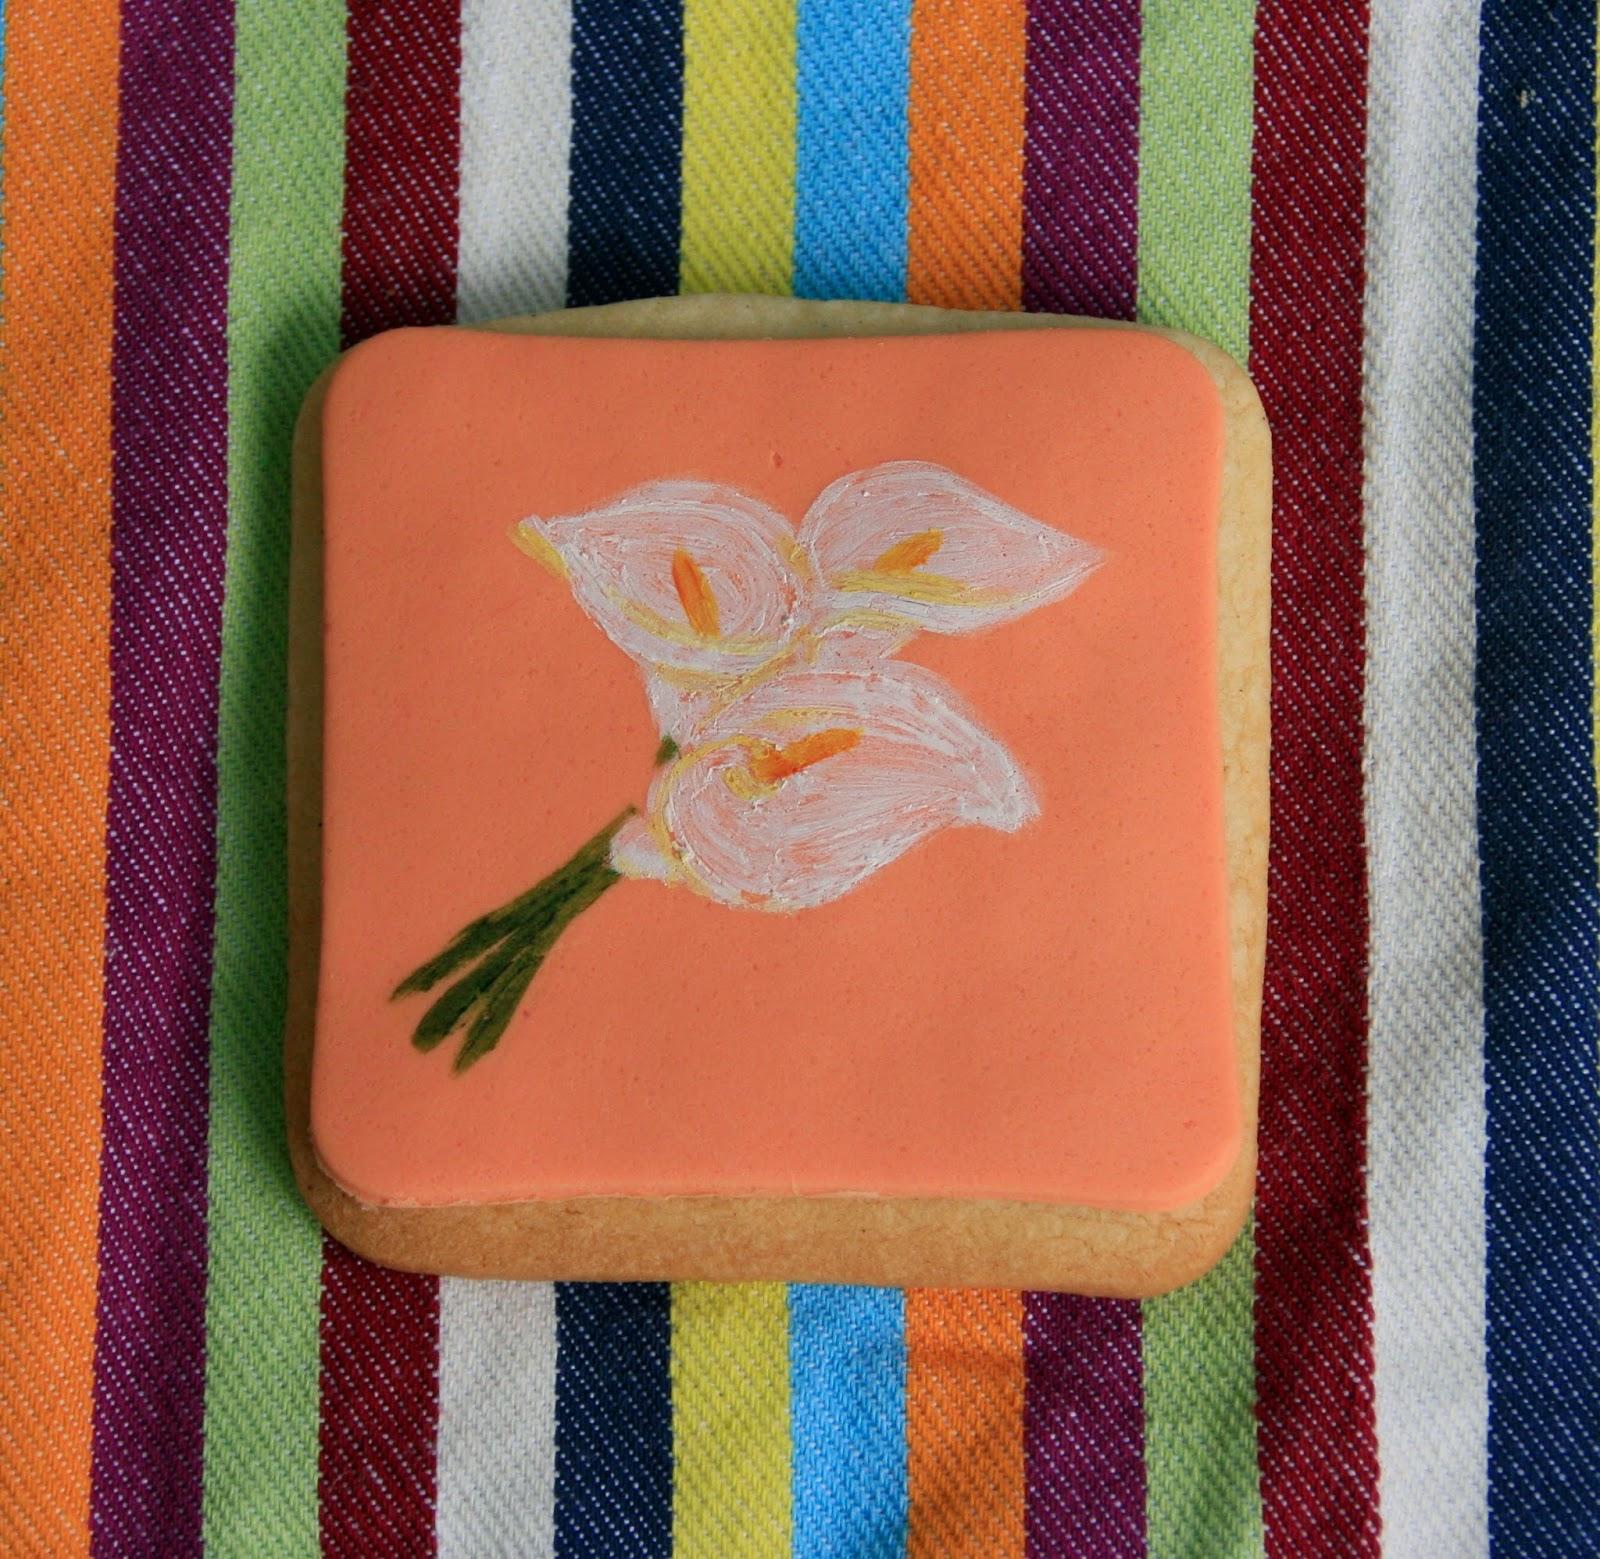 Galeta amb flors pintades a ma